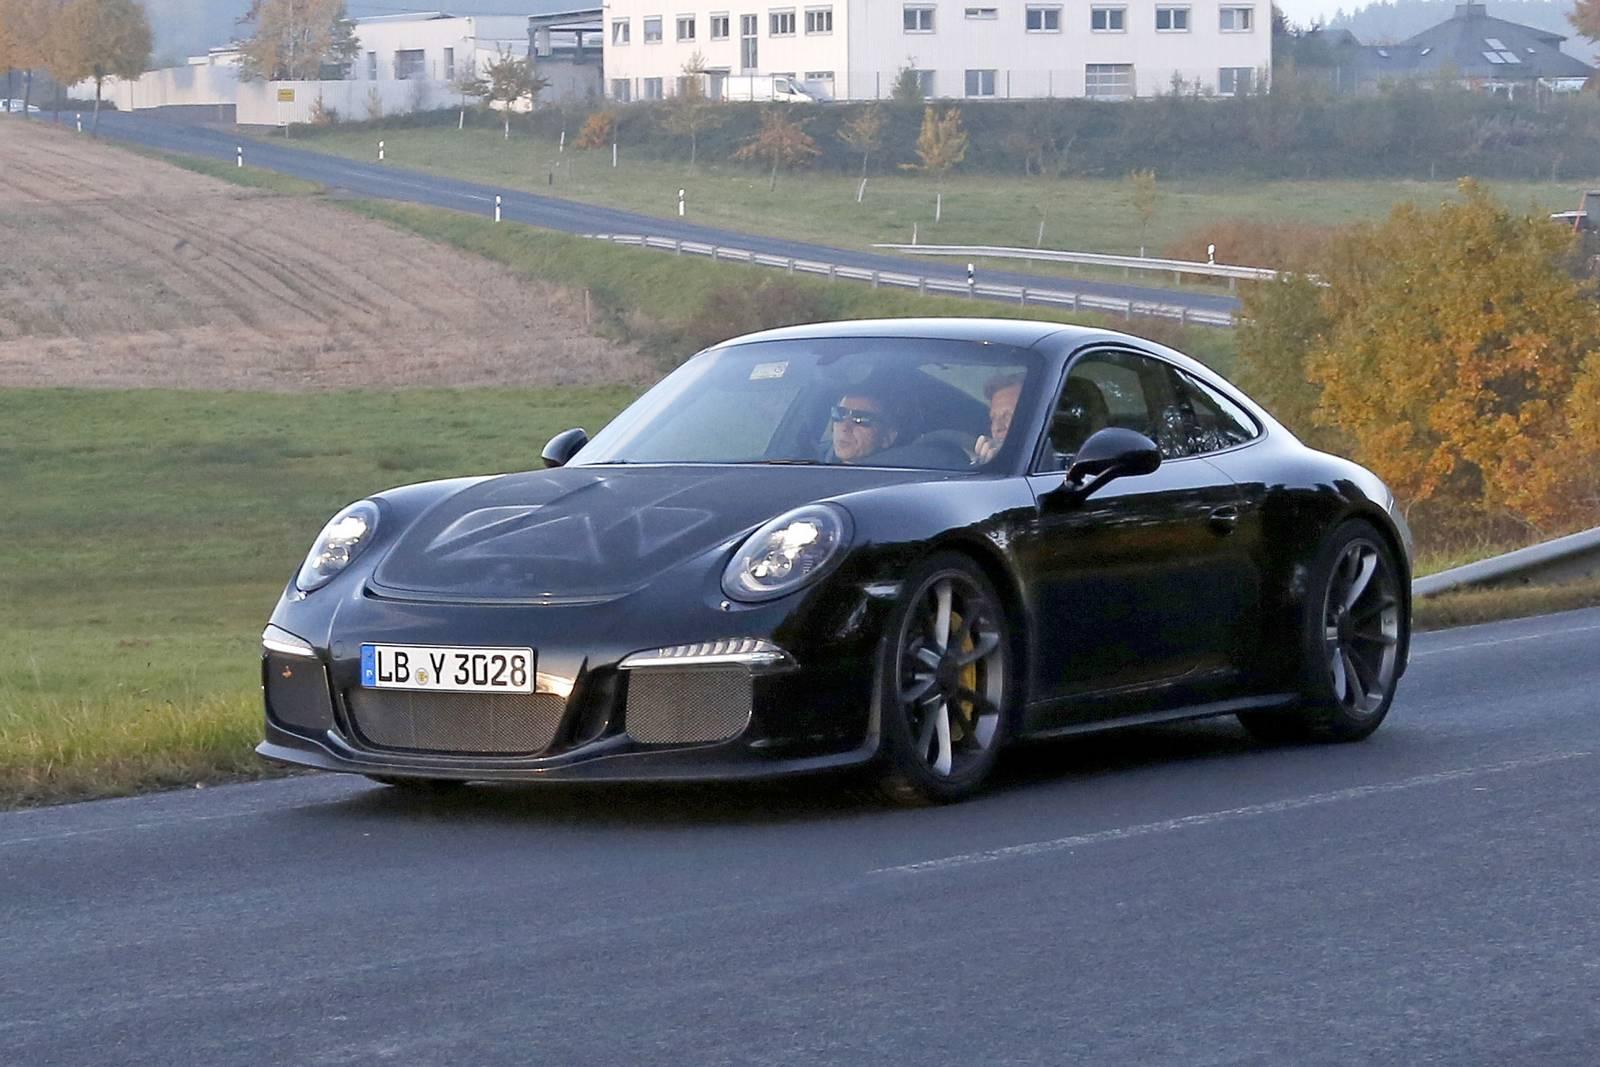 Porsche 911 R First Spy Shots From Testing